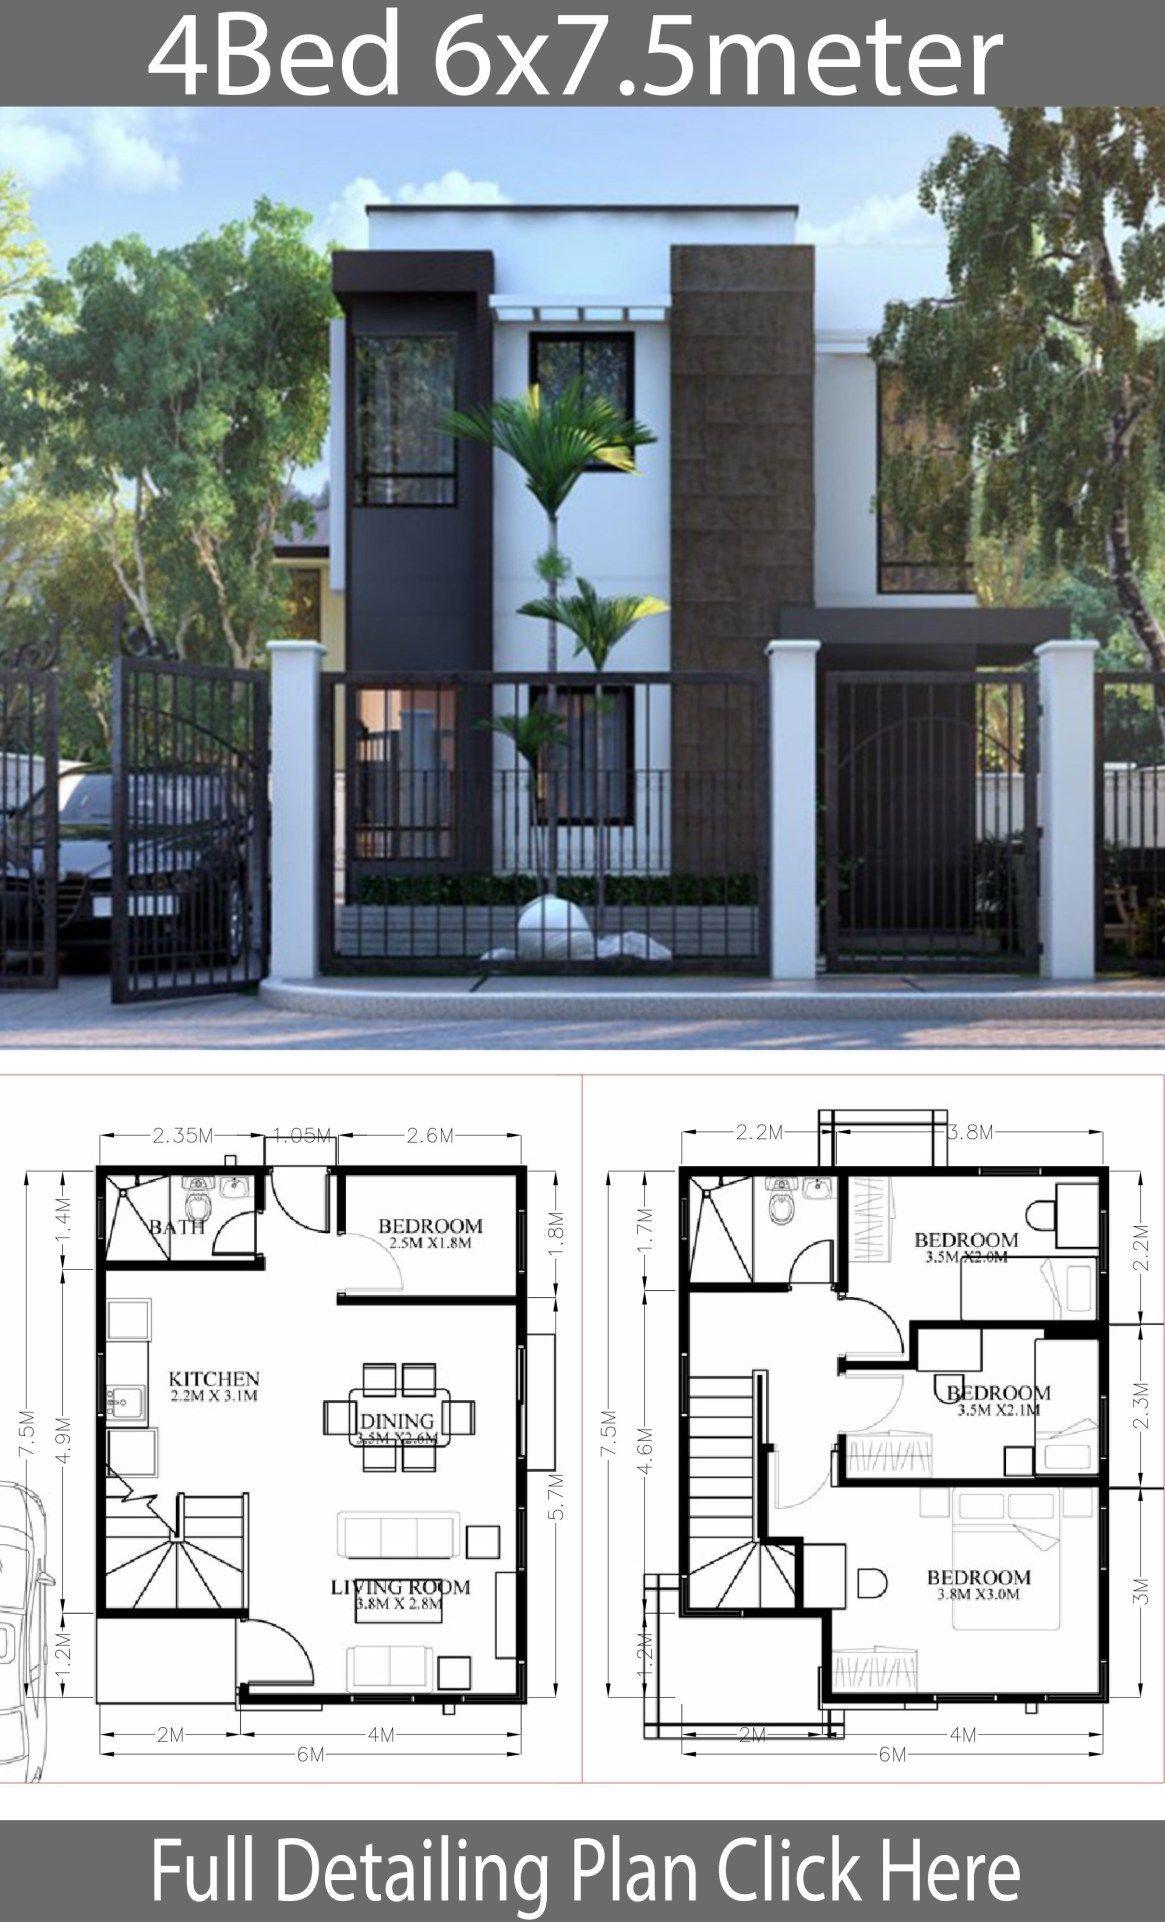 Fresh House Design Plans Modern Small Small Home Design Plan 6x7 5m With 4 Bedrooms In 2020 Small House Design Plans House Construction Plan Small House Design